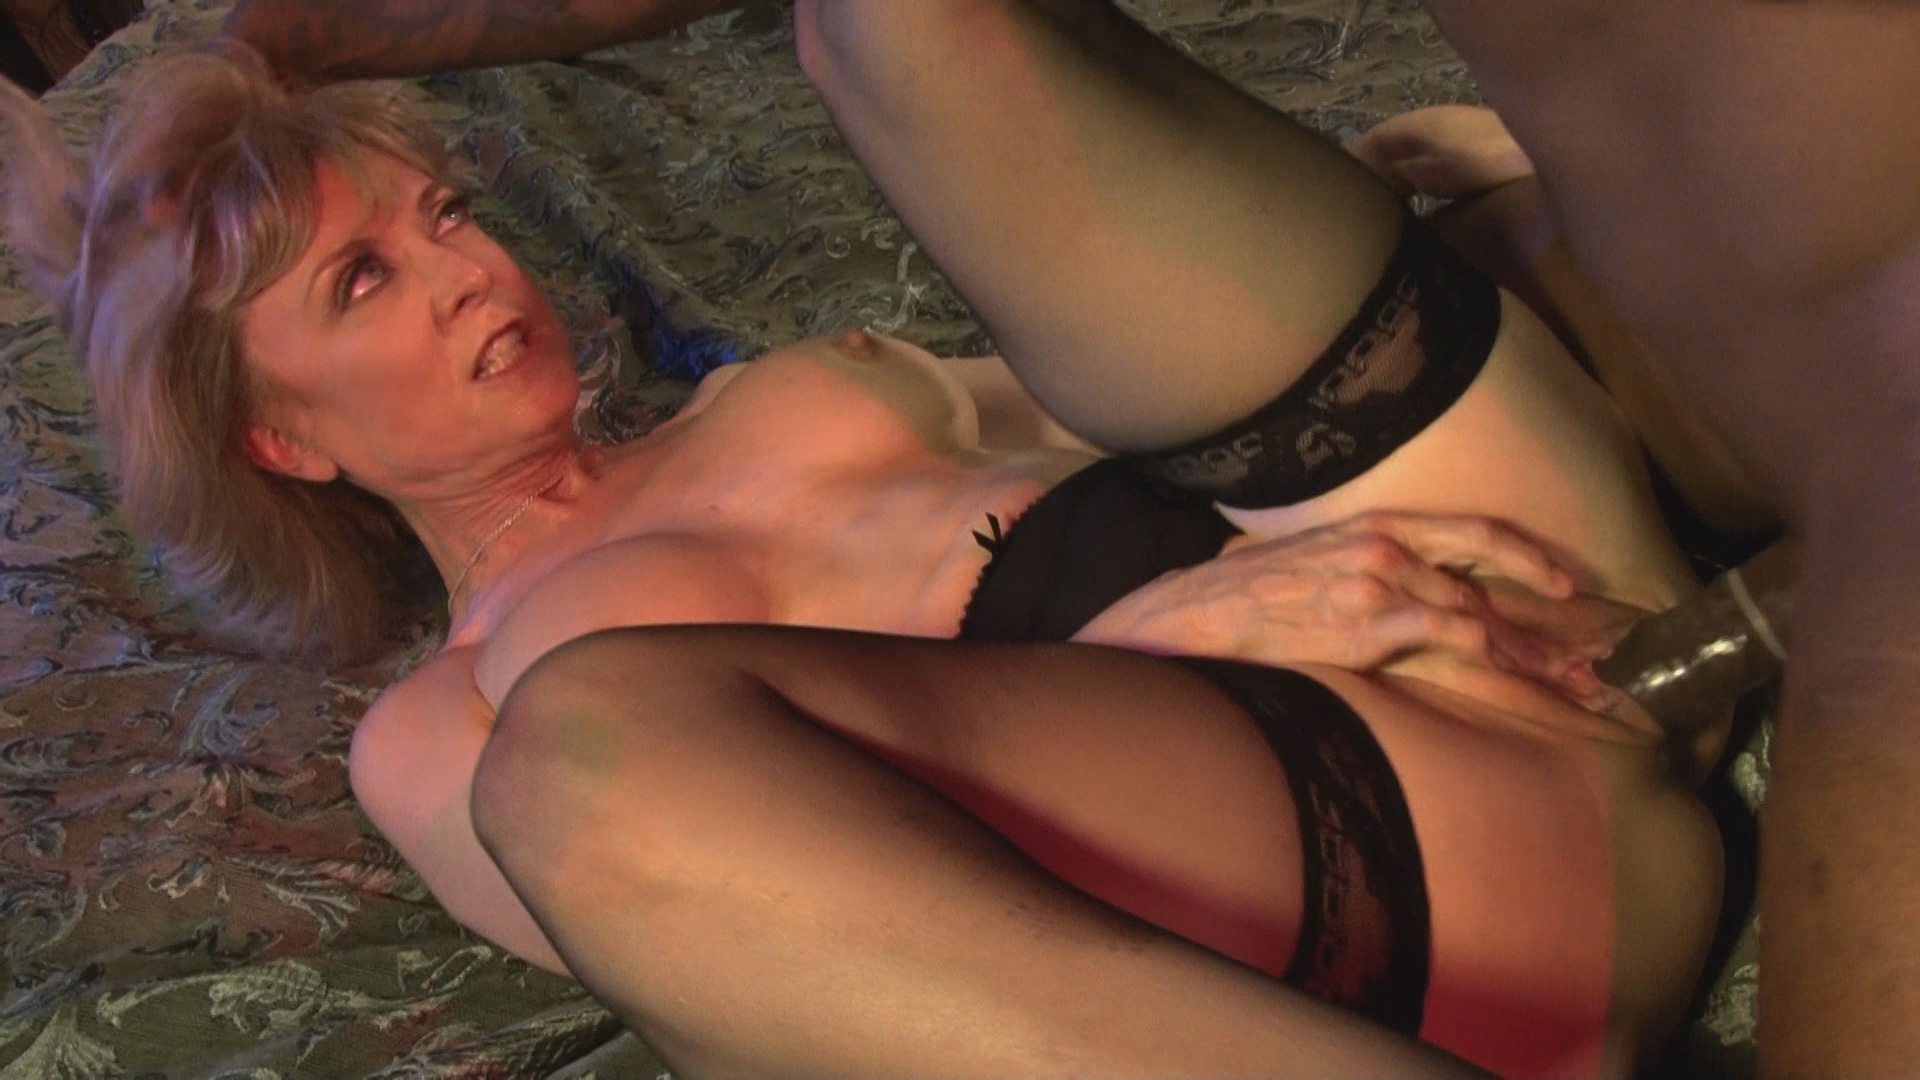 Смотреть порно анал с нина хартли онлайн бесплатно фото 646-588